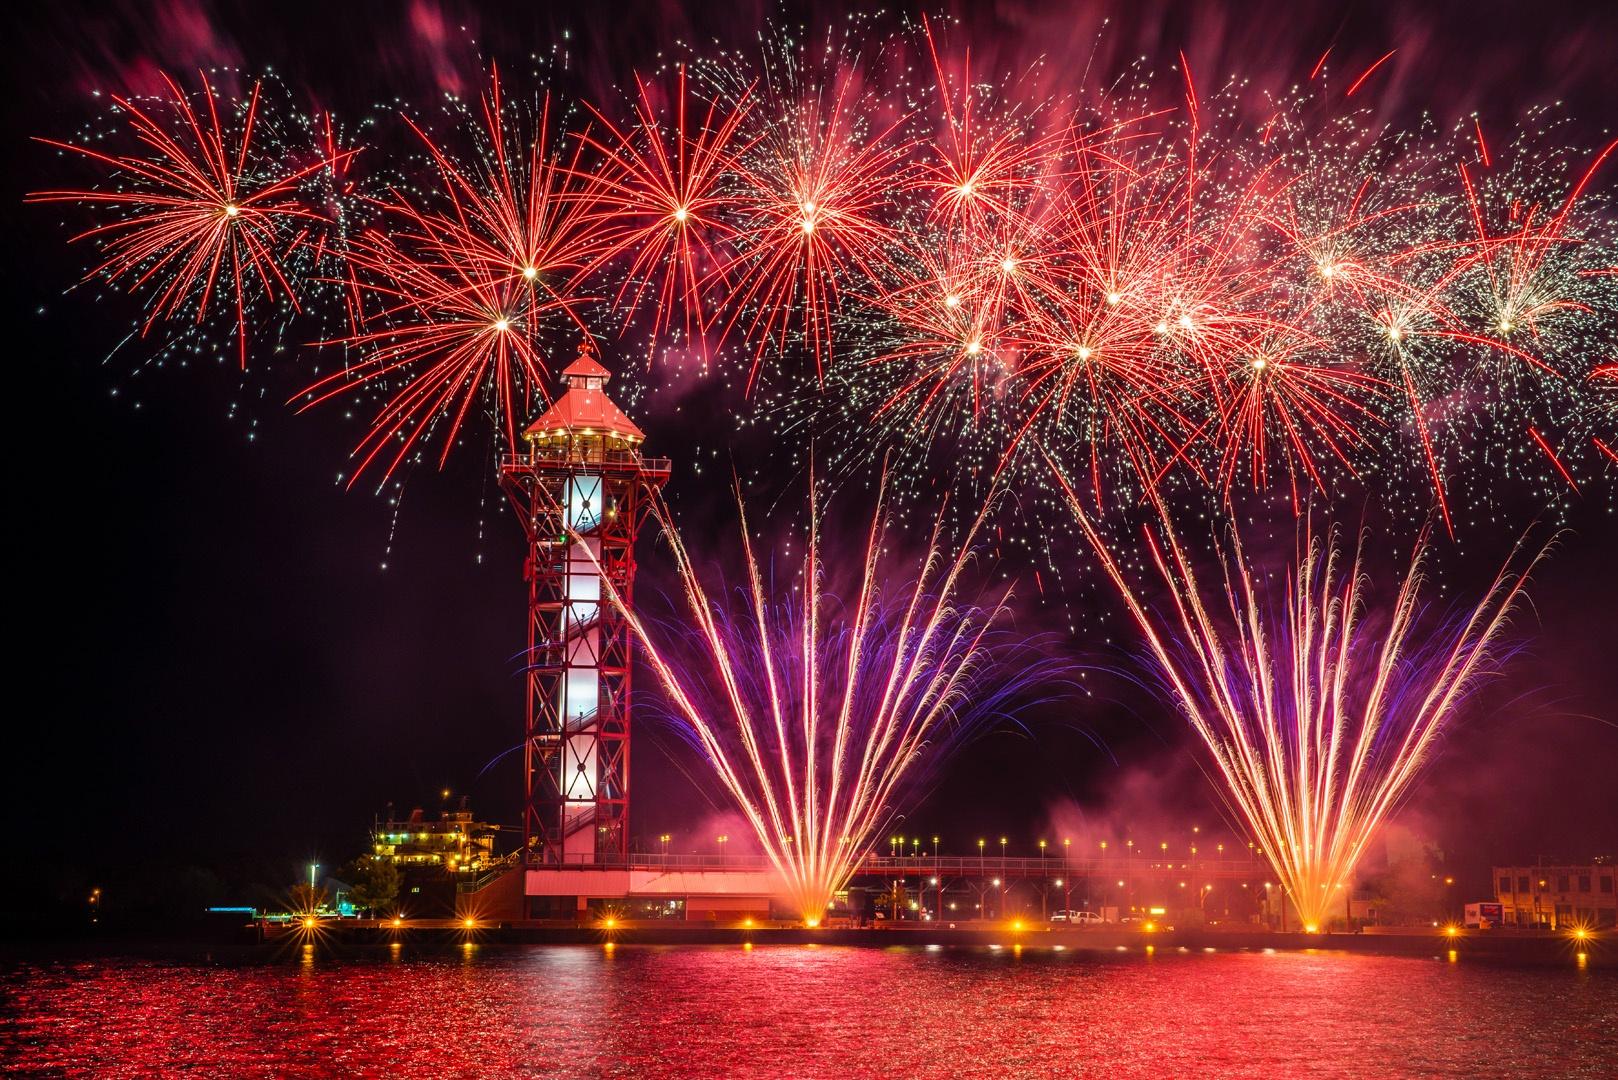 IBEW_712_Fireworks-035.jpg